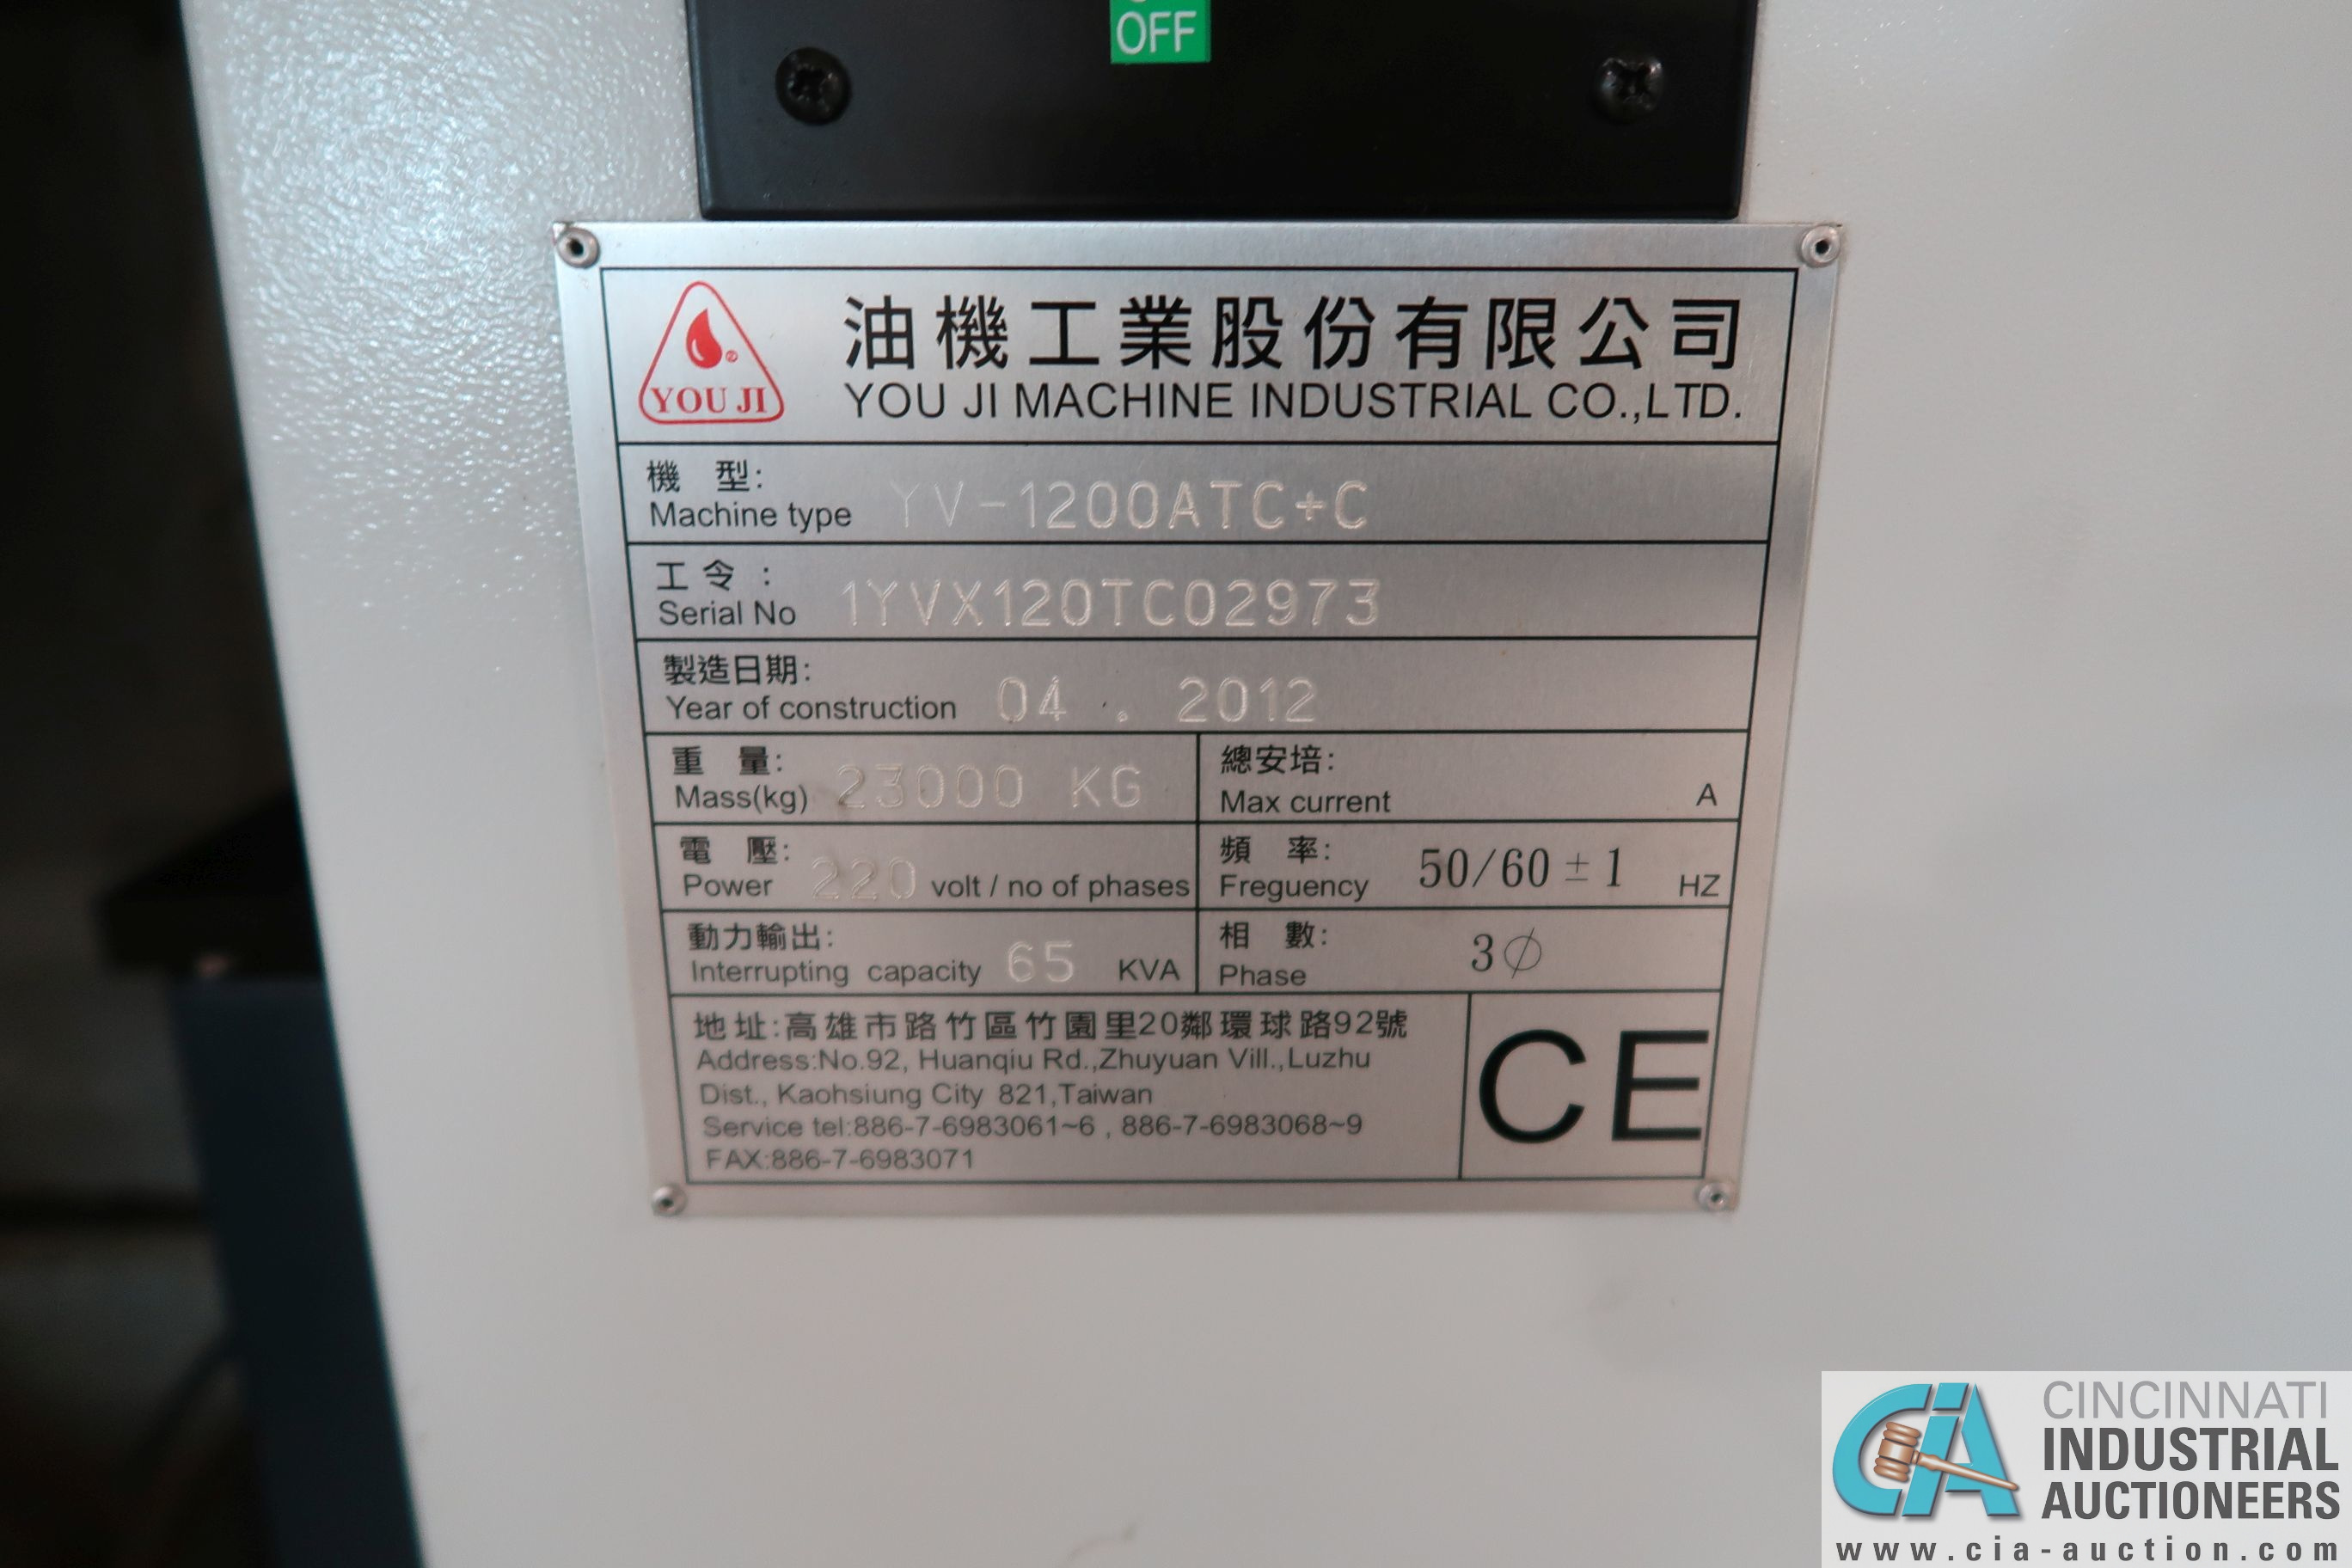 "49"" / 63"" YOU JI MODEL YV-1200ATC+C CNC VERTICAL BORING MILL W/20 HP LIVE TOOLING; - Image 5 of 25"